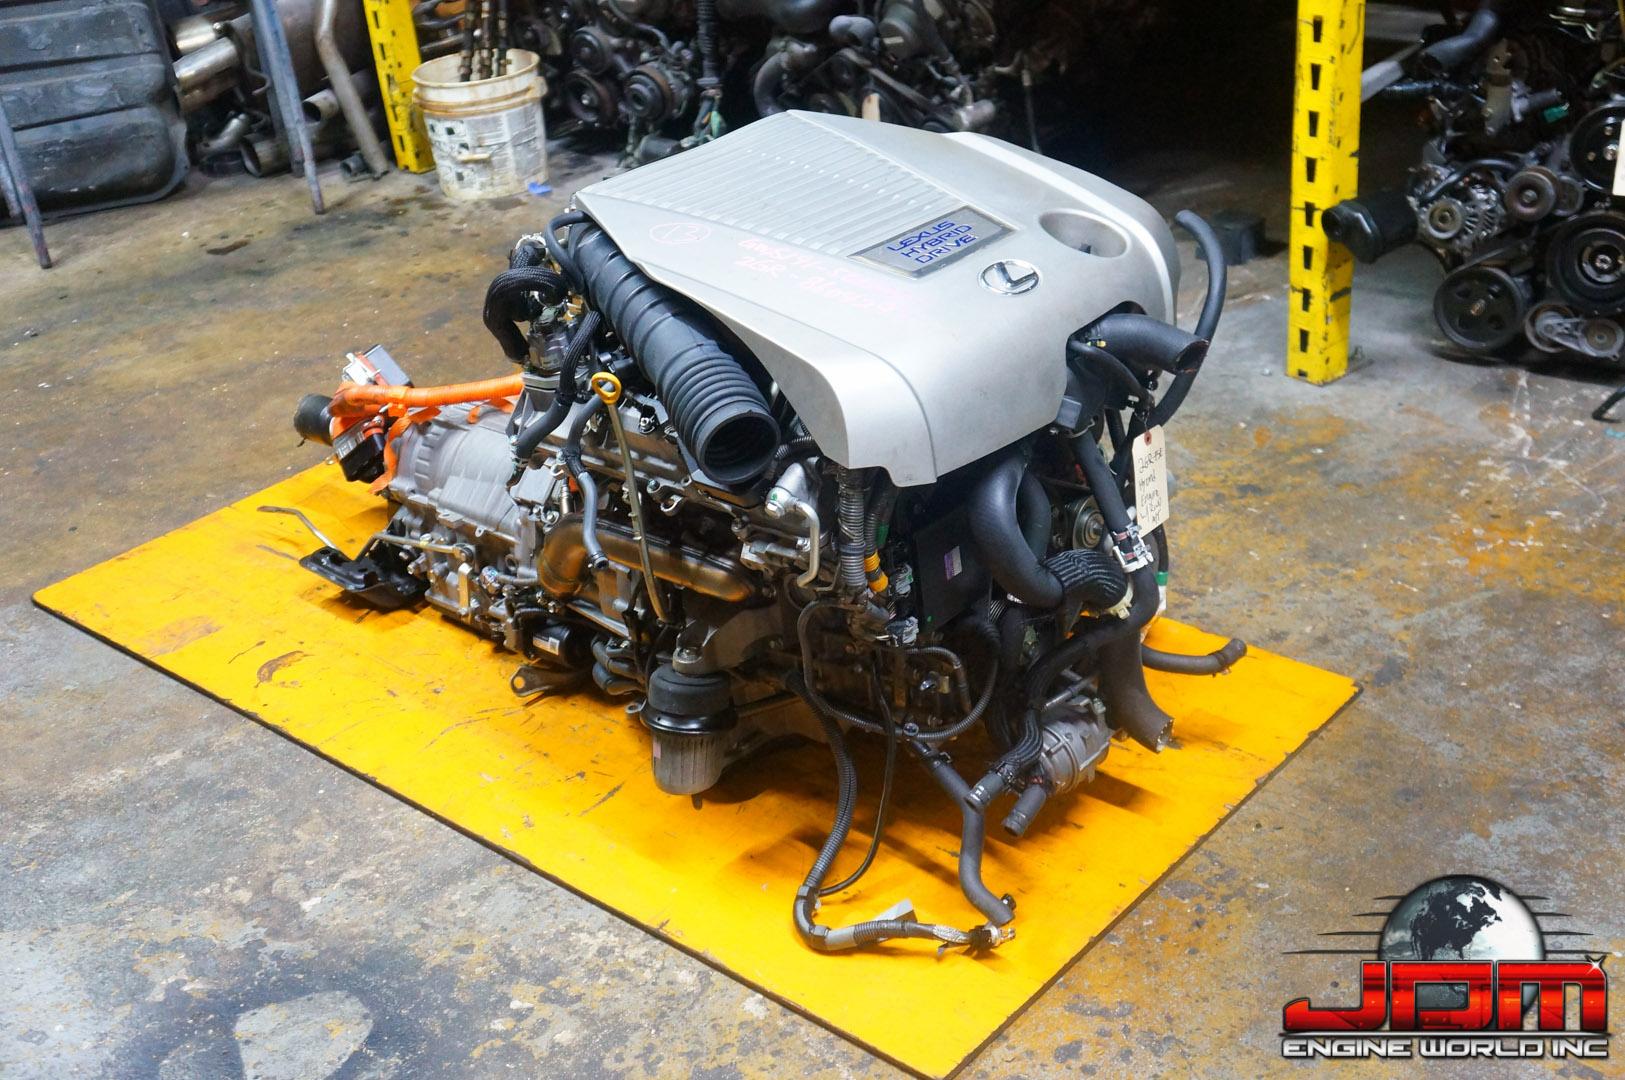 JDM LEXUS 07 08 09 10 11 GS350 3.5L 2GR-FSE ENGINE w/ RWD AUTOMATIC TRANSMISSION